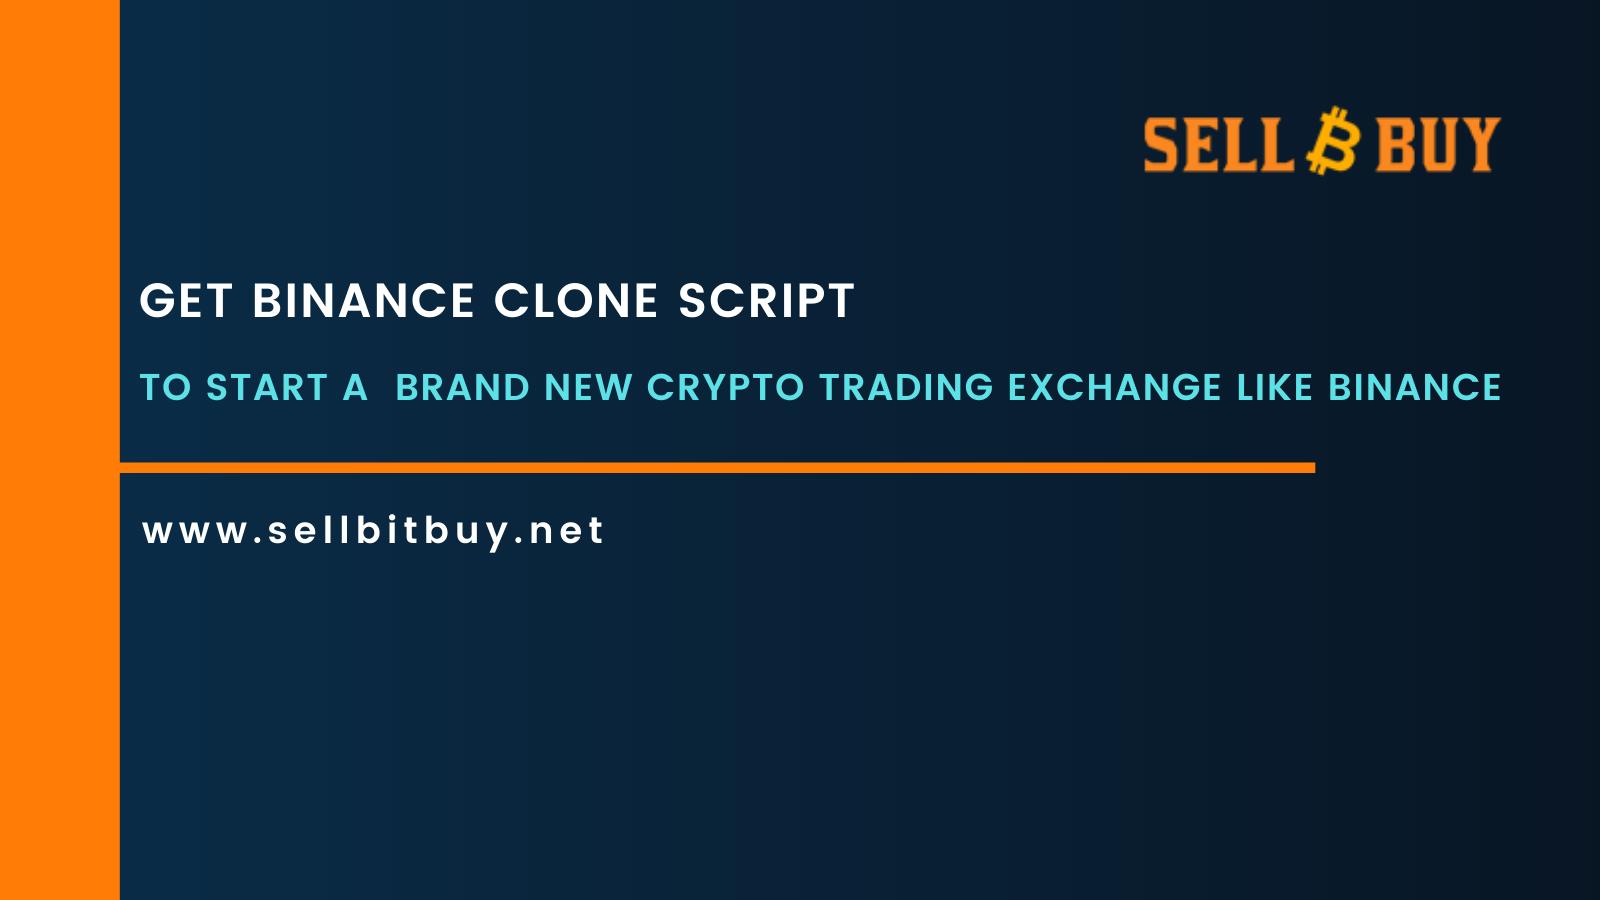 Binance Clone Script - To Start a  Brand New Crypto Trading Exchange Like Binance